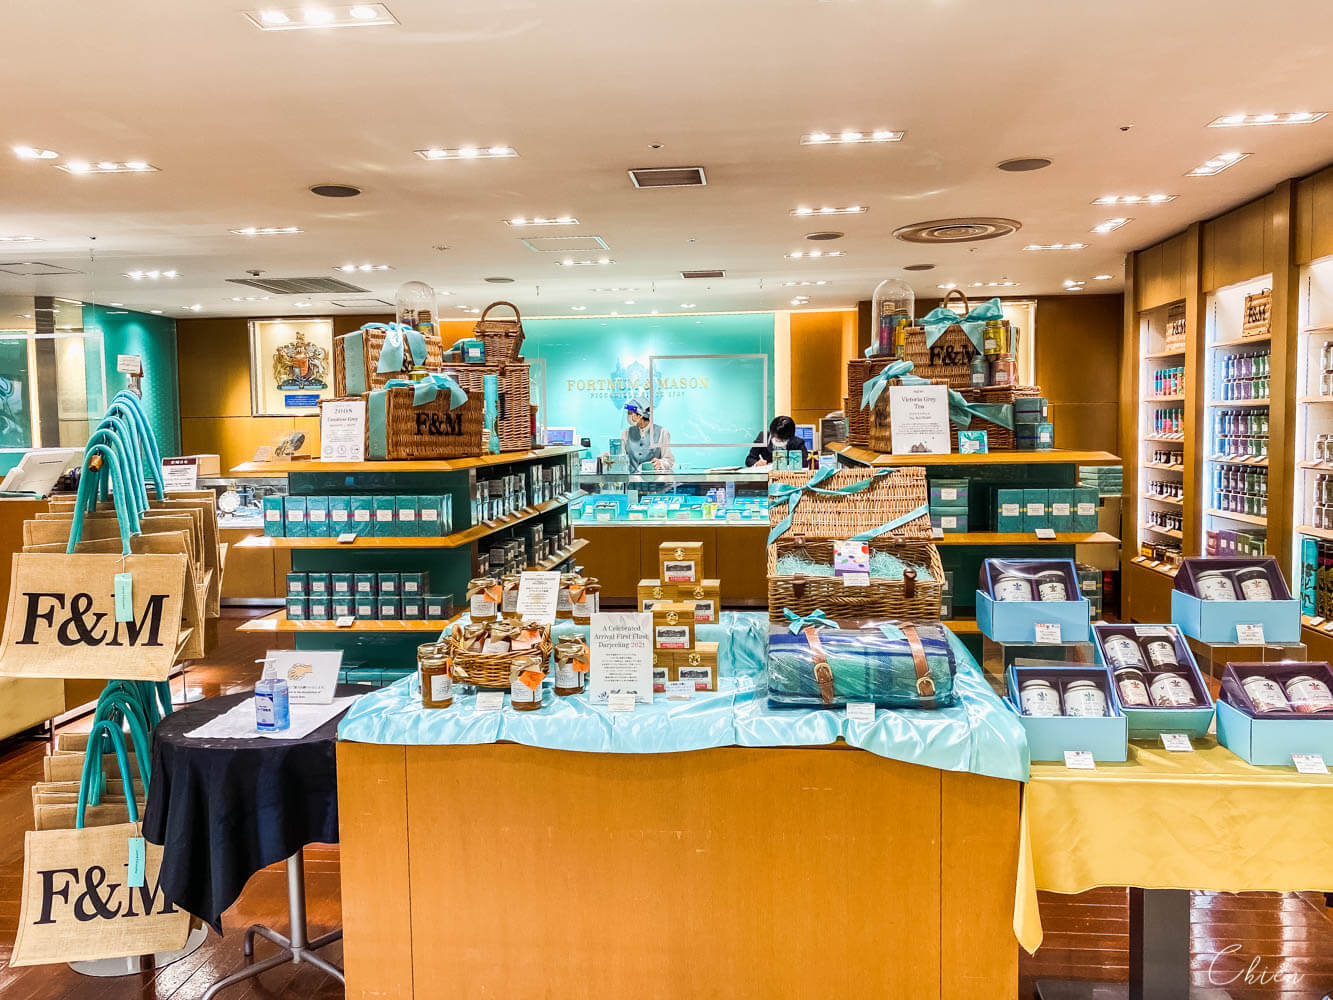 日本三越本店 地下美食街:Fortnum&Mason Concept Shop 英式下午茶